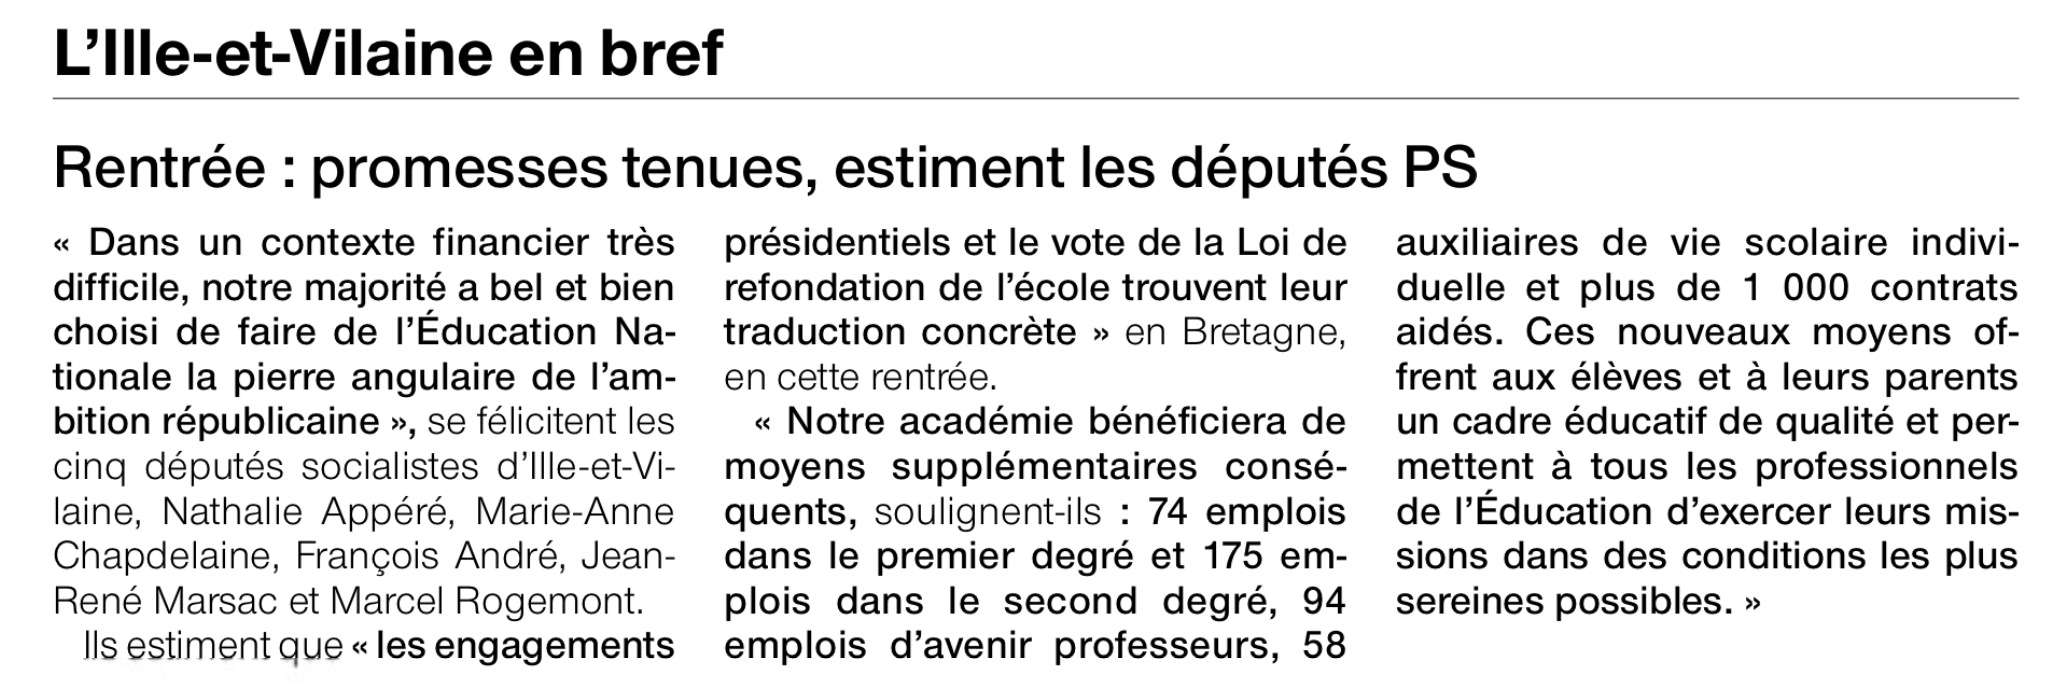 20130905 OF Rentree scolaire